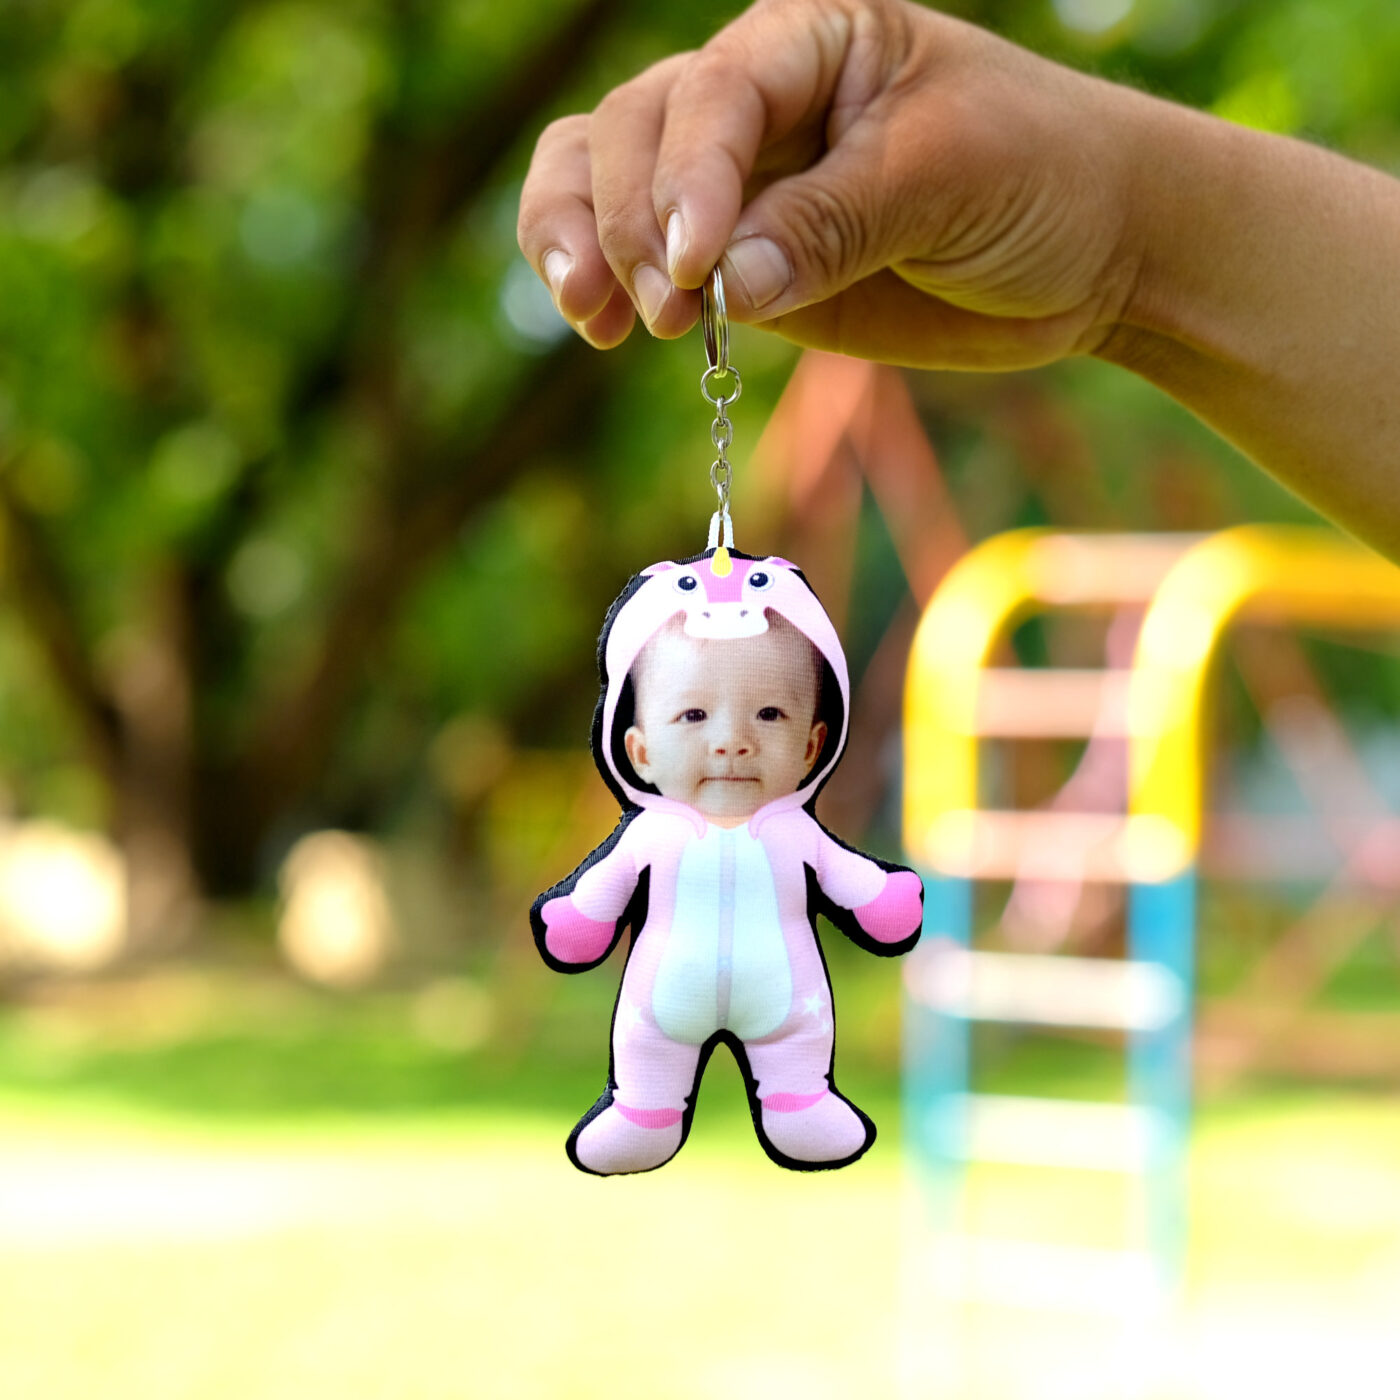 Human Doll Pillow Keychain